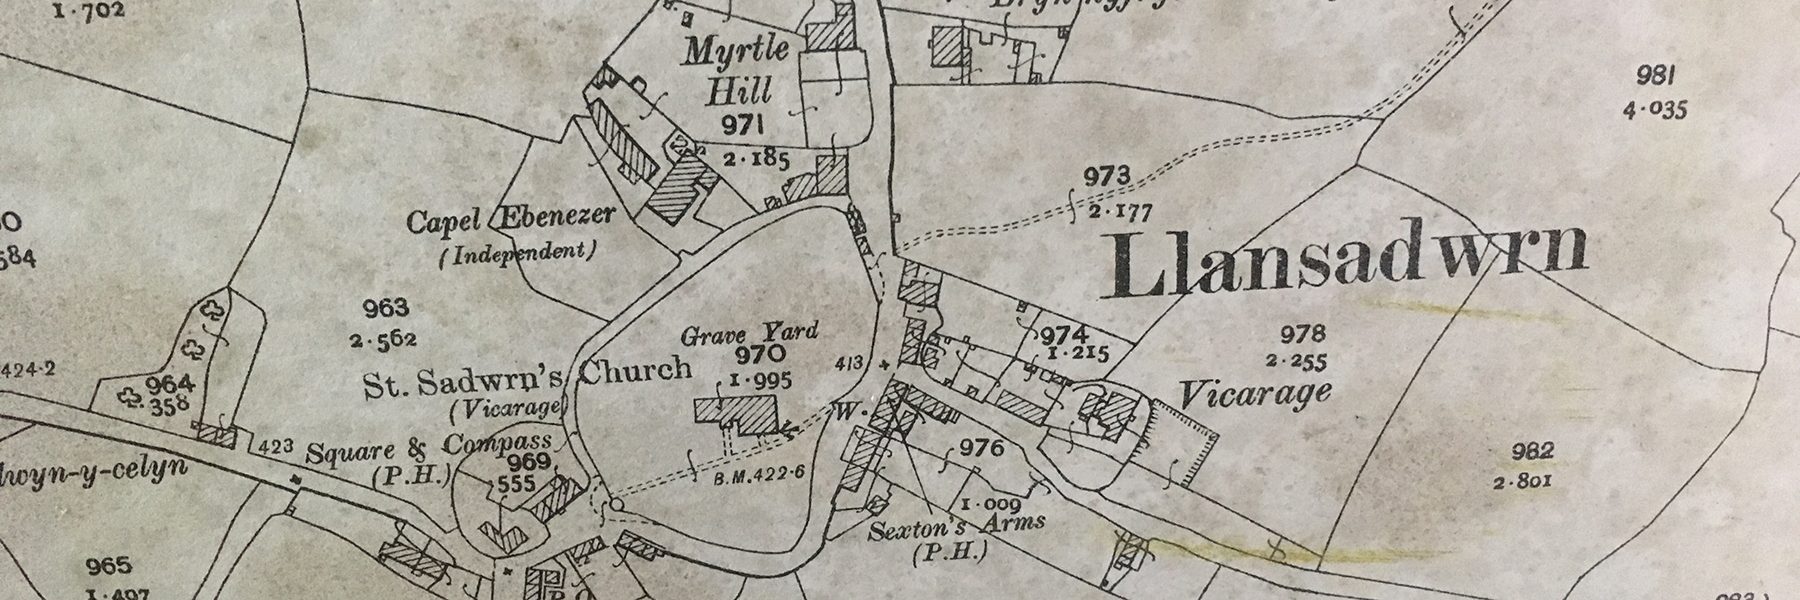 Llansadwrn old map